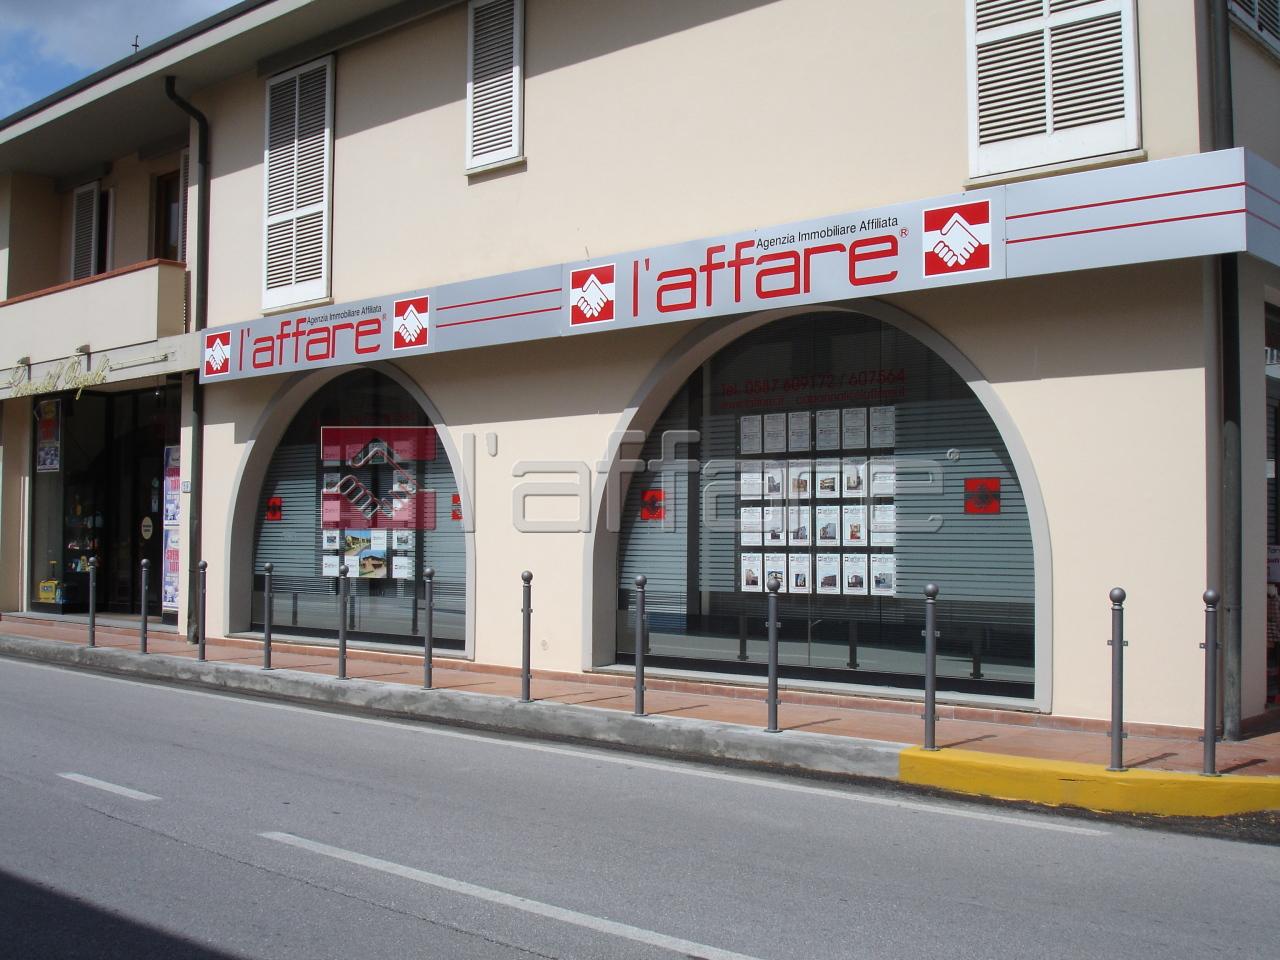 Locale comm.le/Fondo a Capannoli